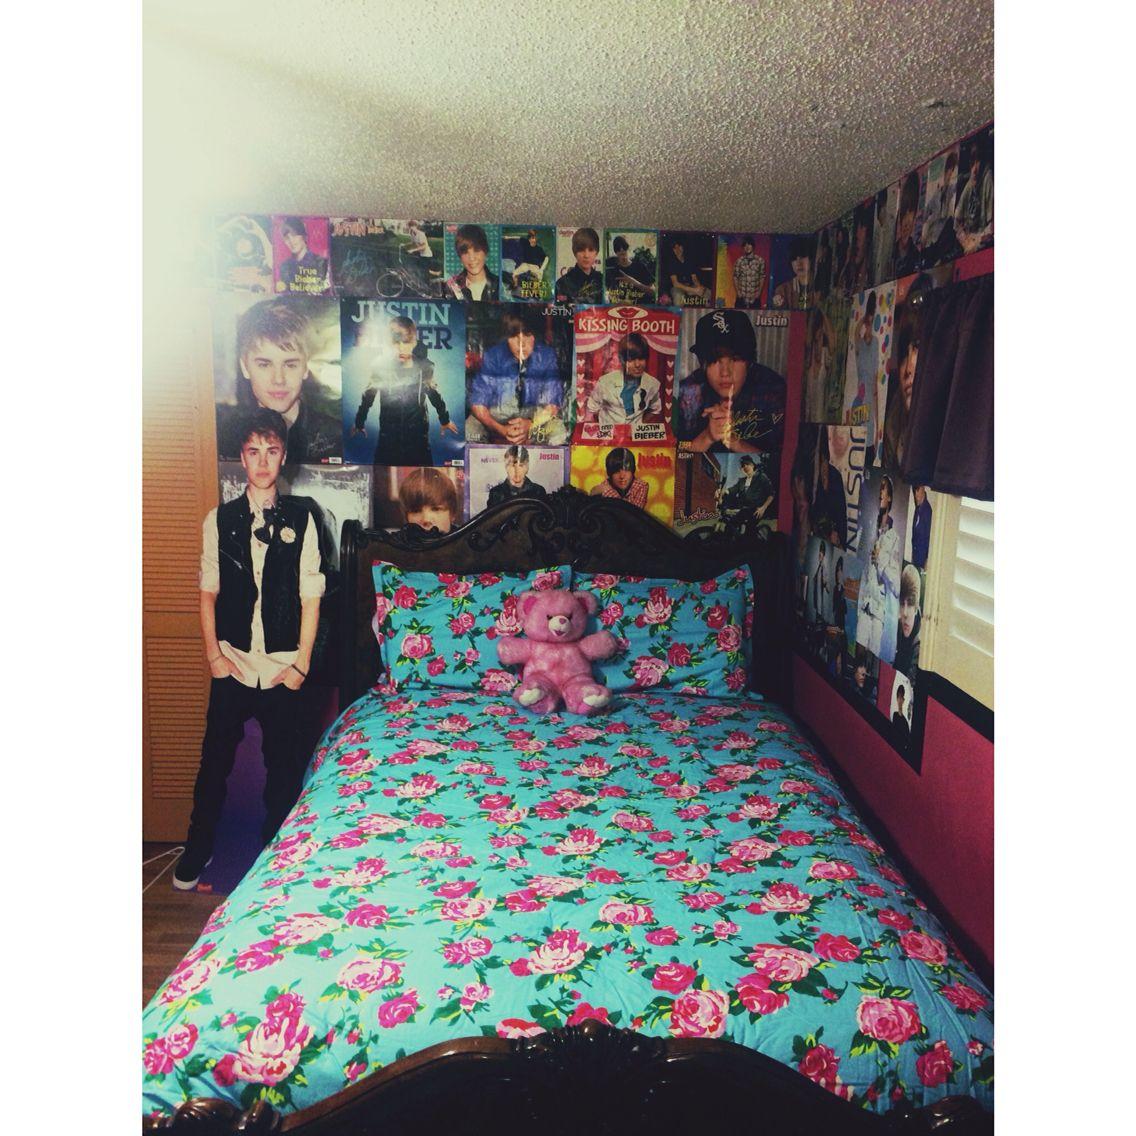 My dream room tbh #BelieberProbs